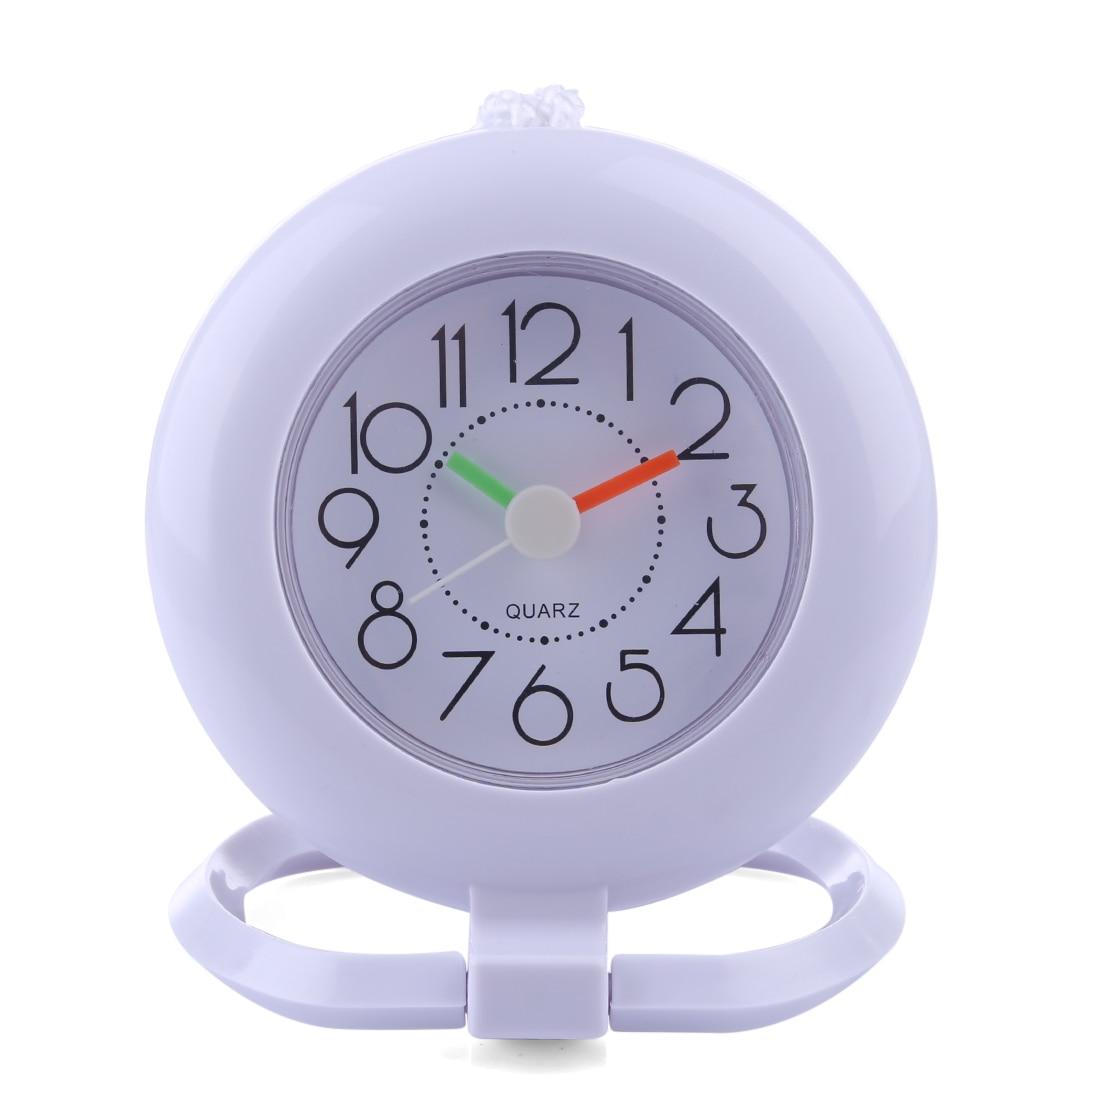 Silent Bathroom Wall Clock Waterproof Table Desk Clocks For Home Kitchen Decor Study Room Simple Clock Quartz Modern Design